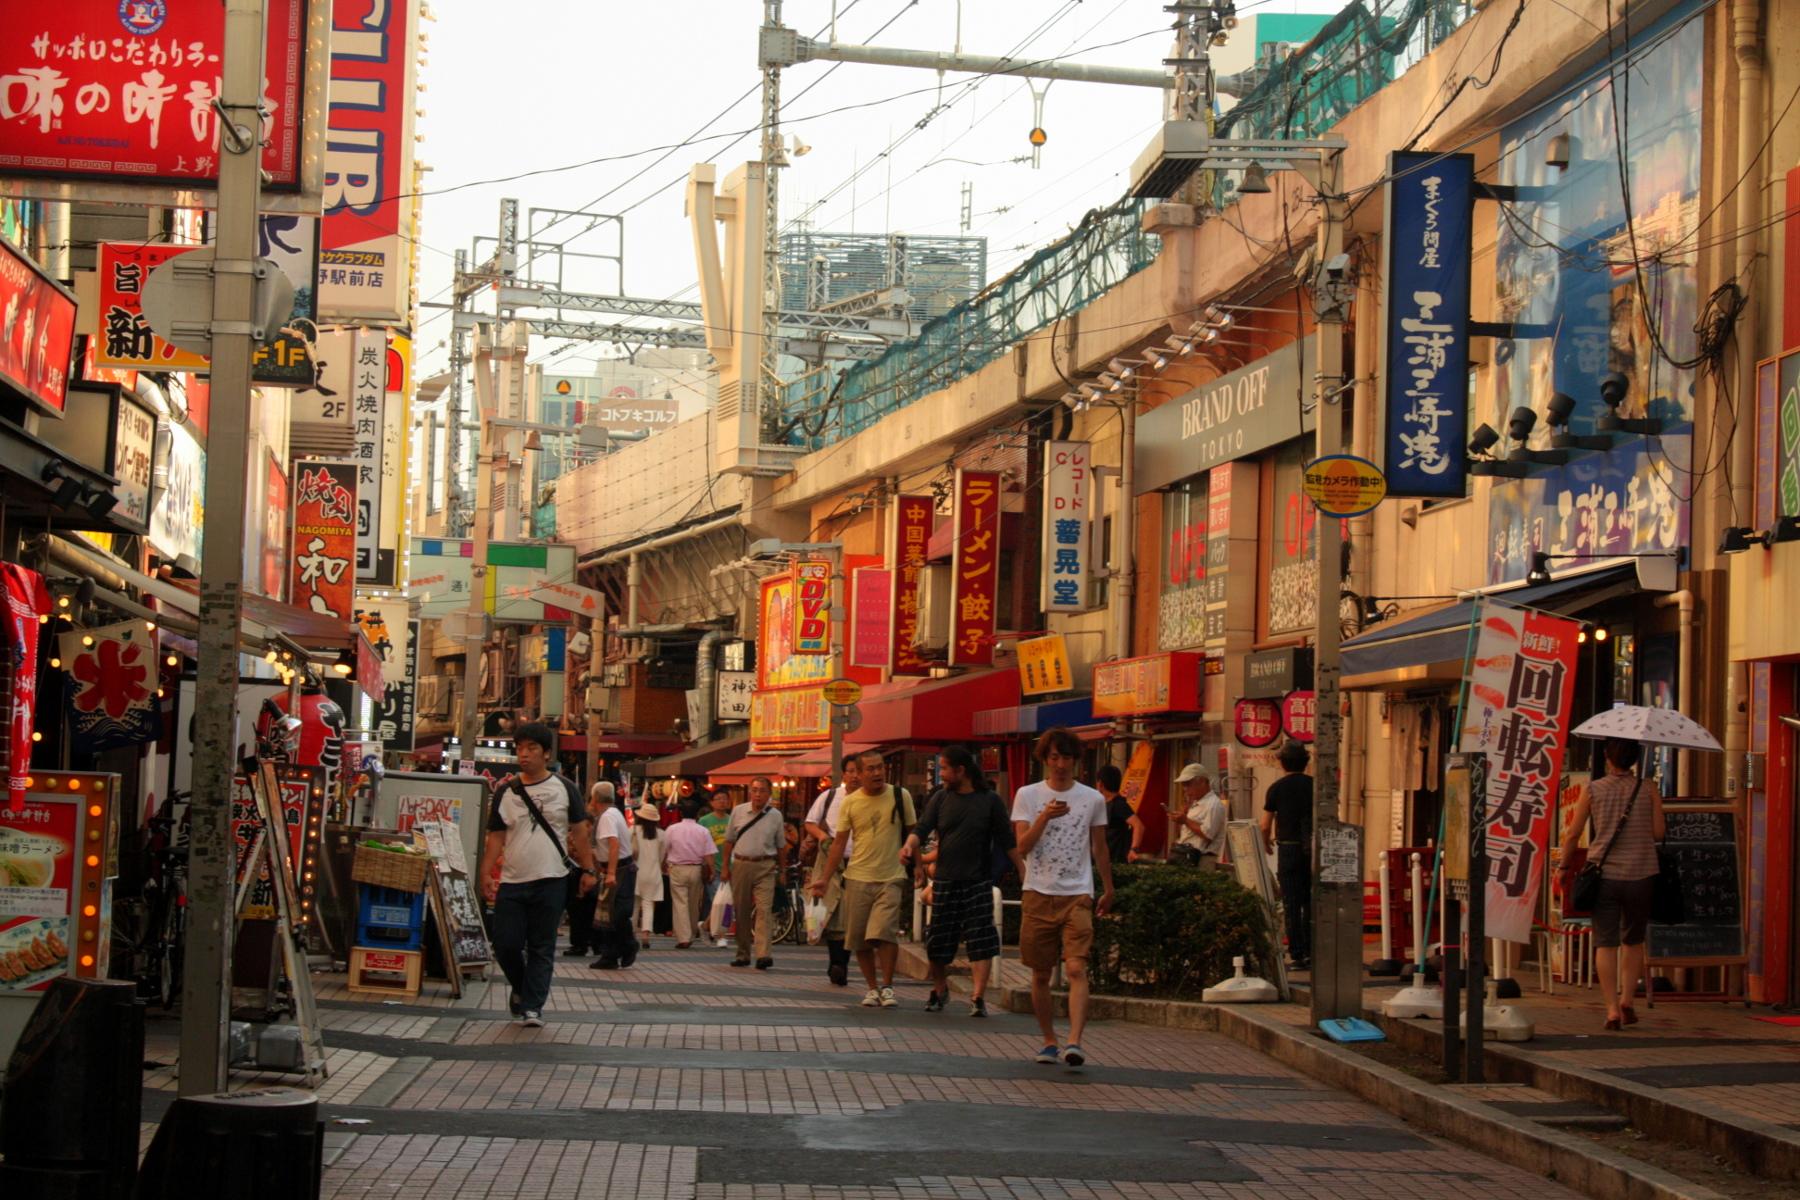 Pourquoi j'ai adoré Tokyo ?